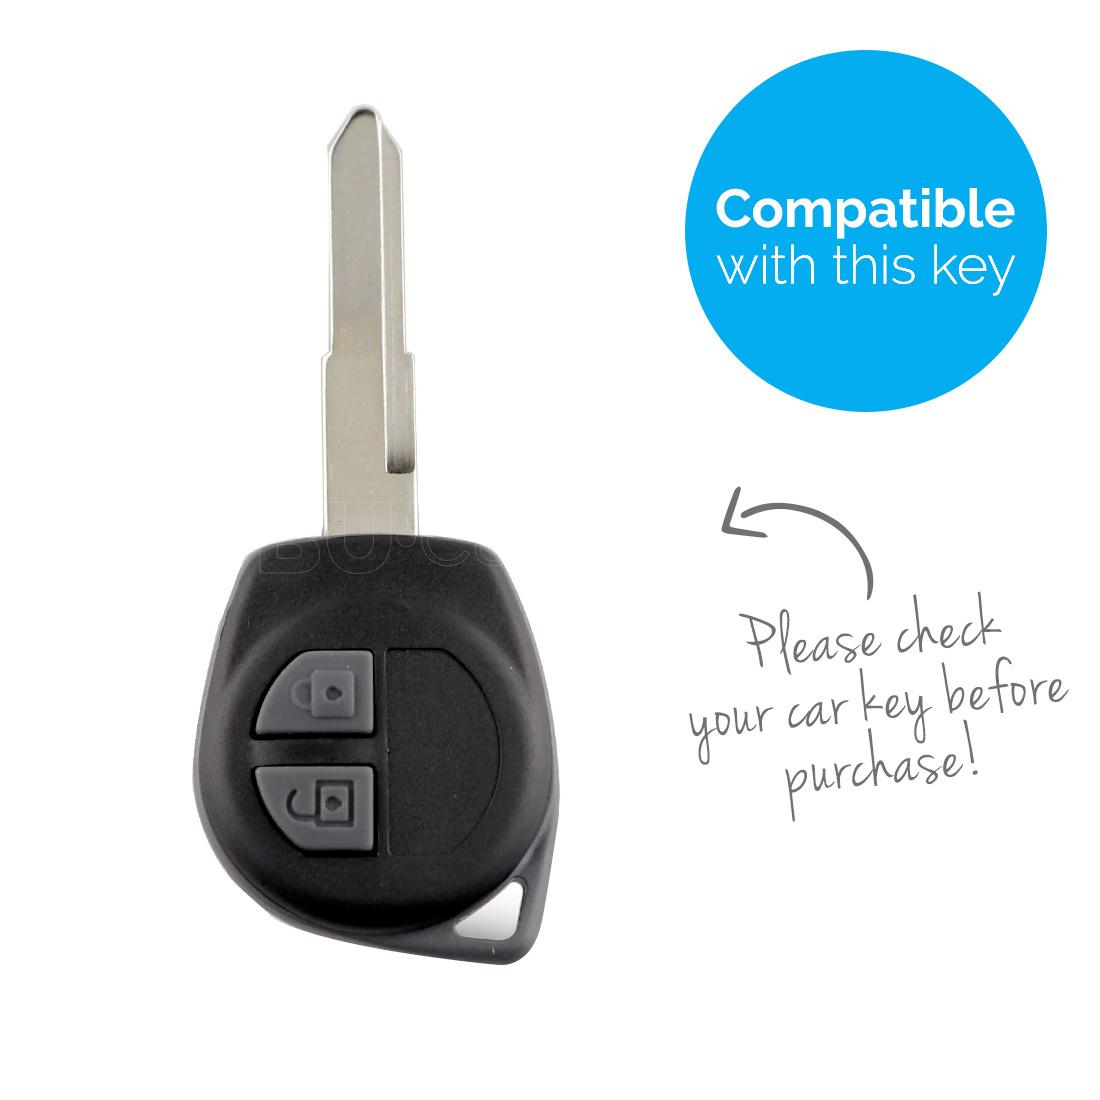 TBU car TBU car Sleutel cover compatibel met Suzuki - Silicone sleutelhoesje - beschermhoesje autosleutel - Zebra